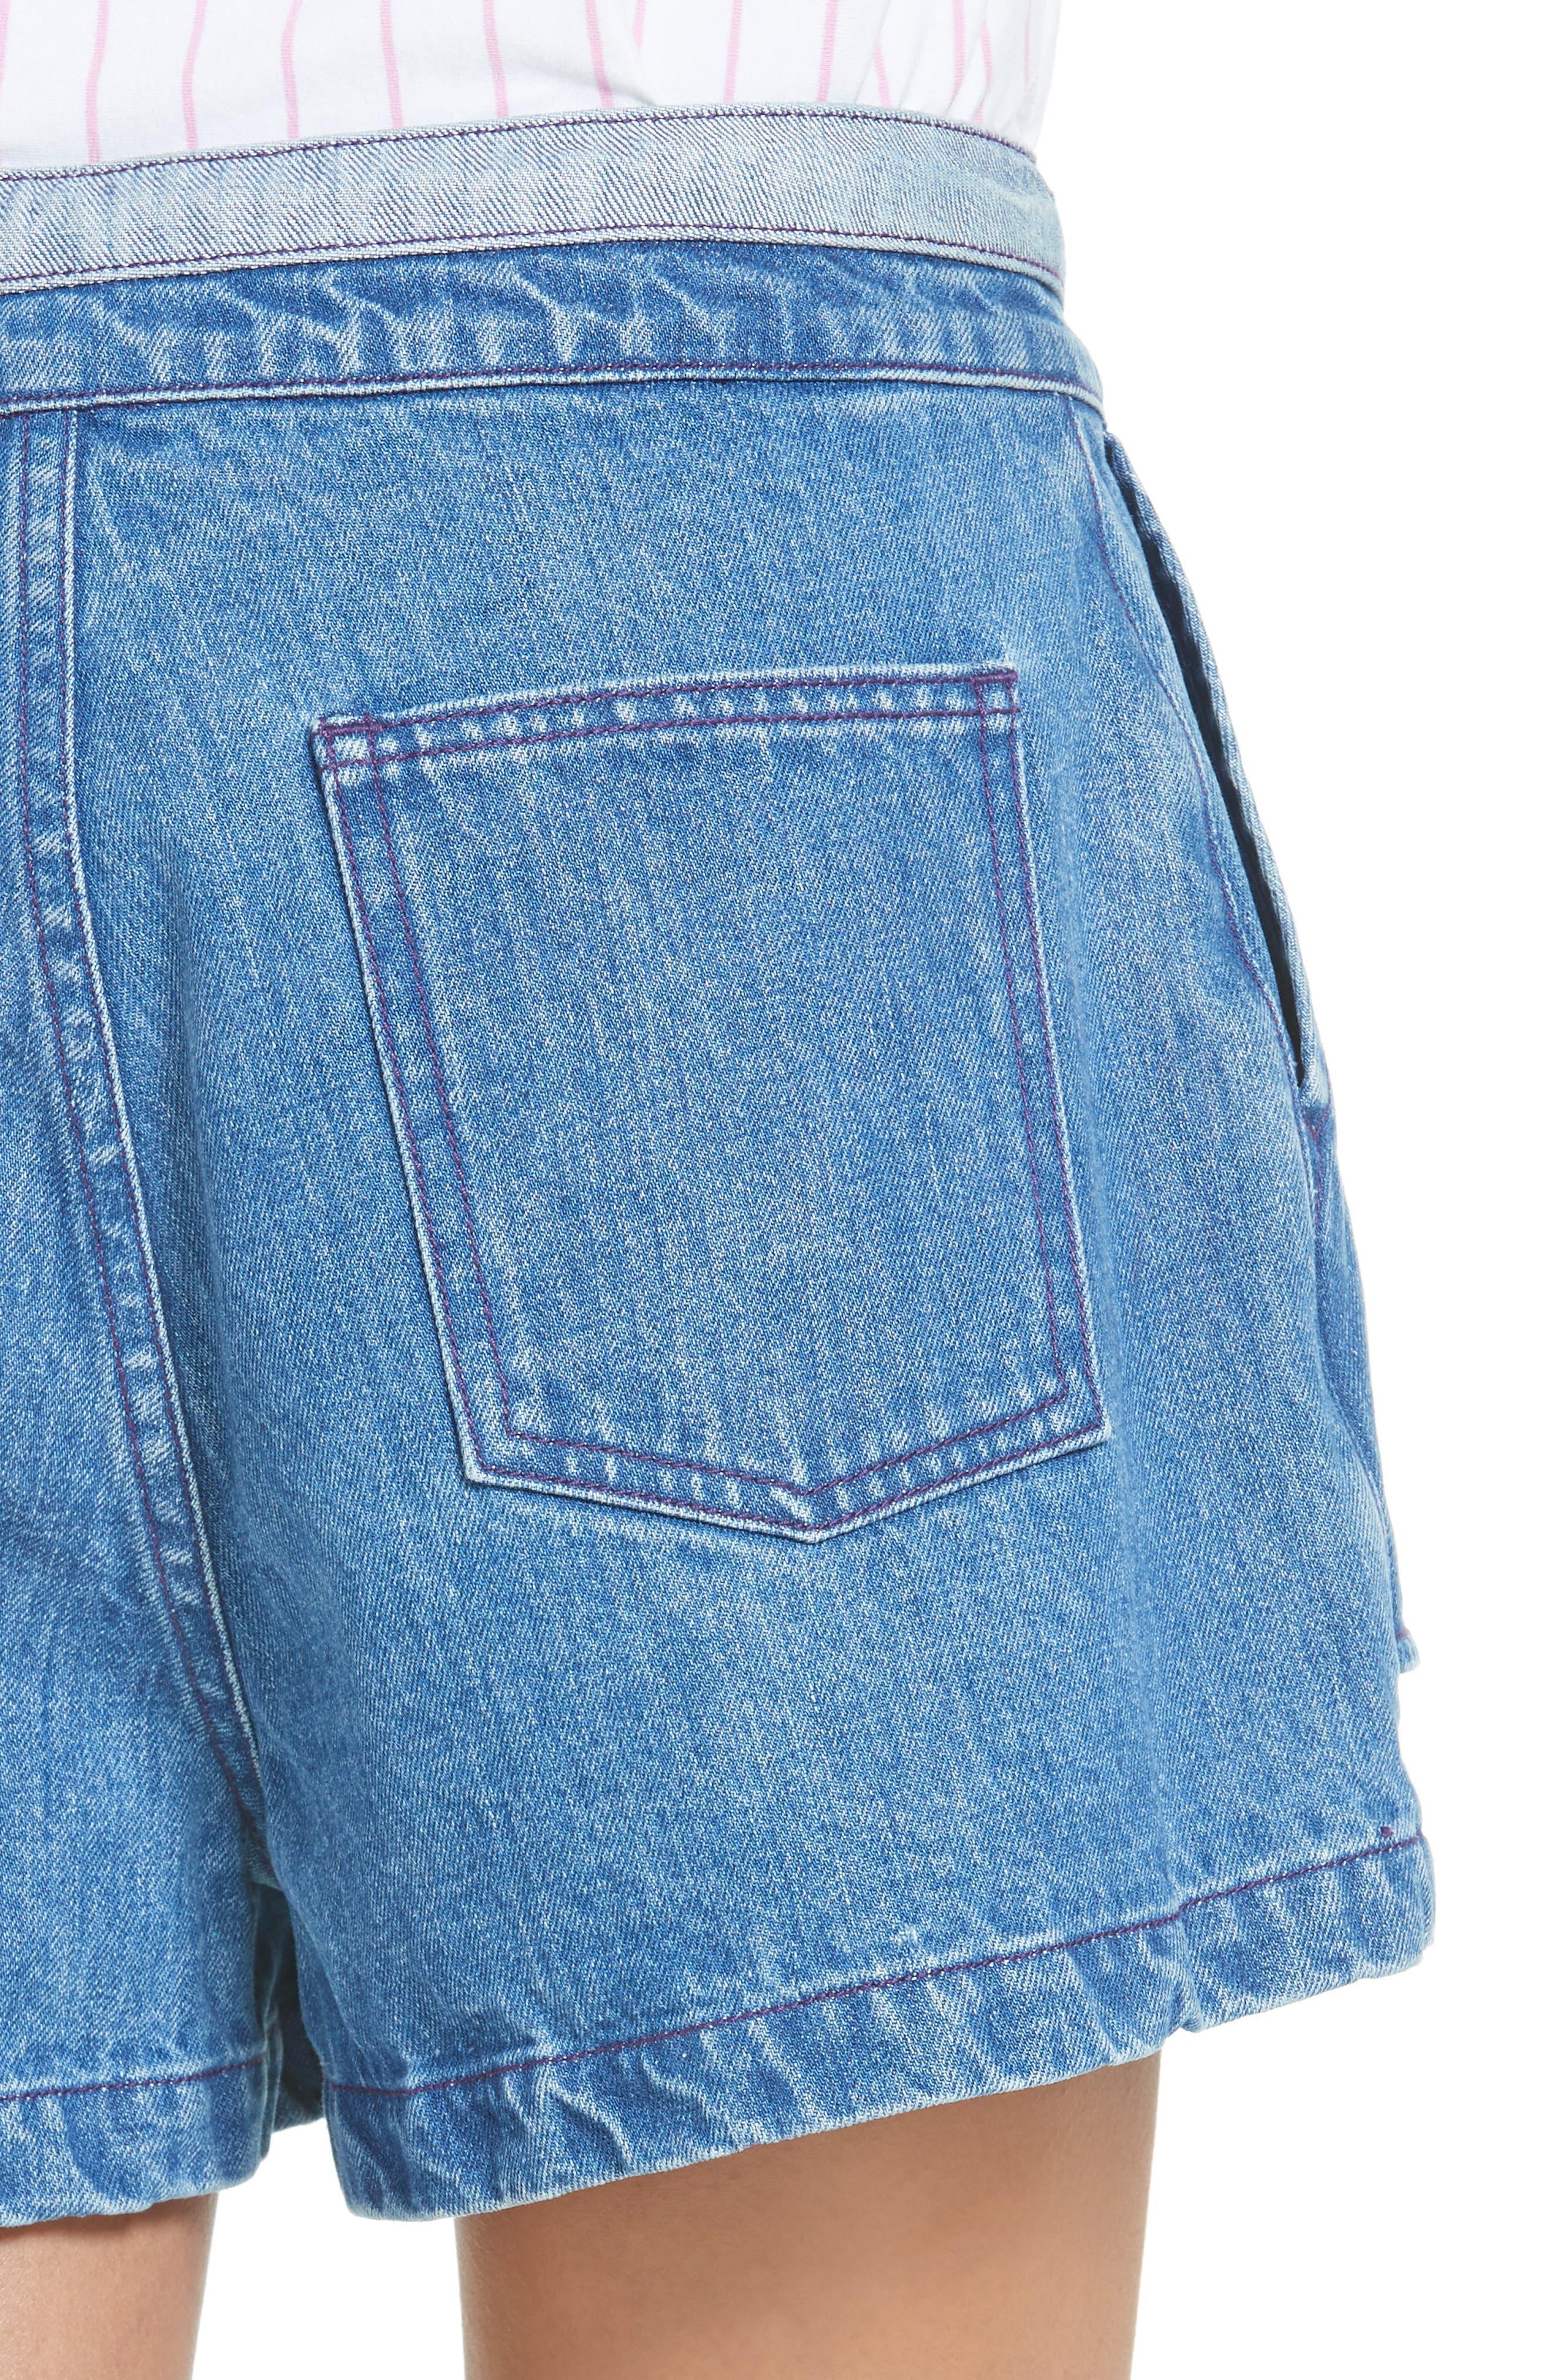 Inside Out Denim Shorts,                             Alternate thumbnail 4, color,                             420